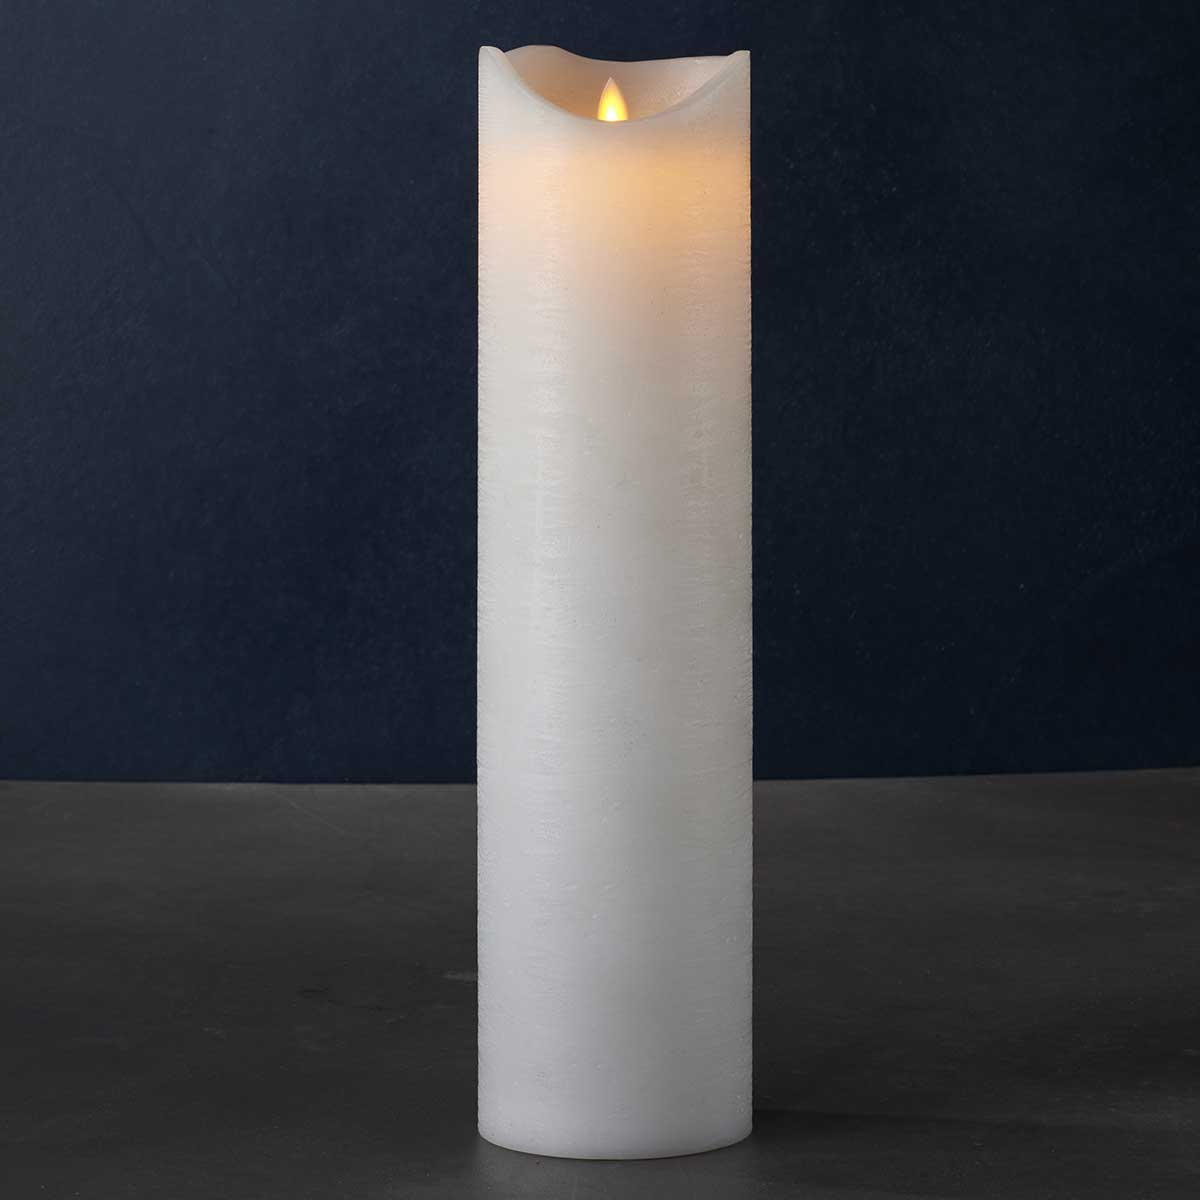 Bougies LED blanche vraie cire H 40 cm * D10 cm